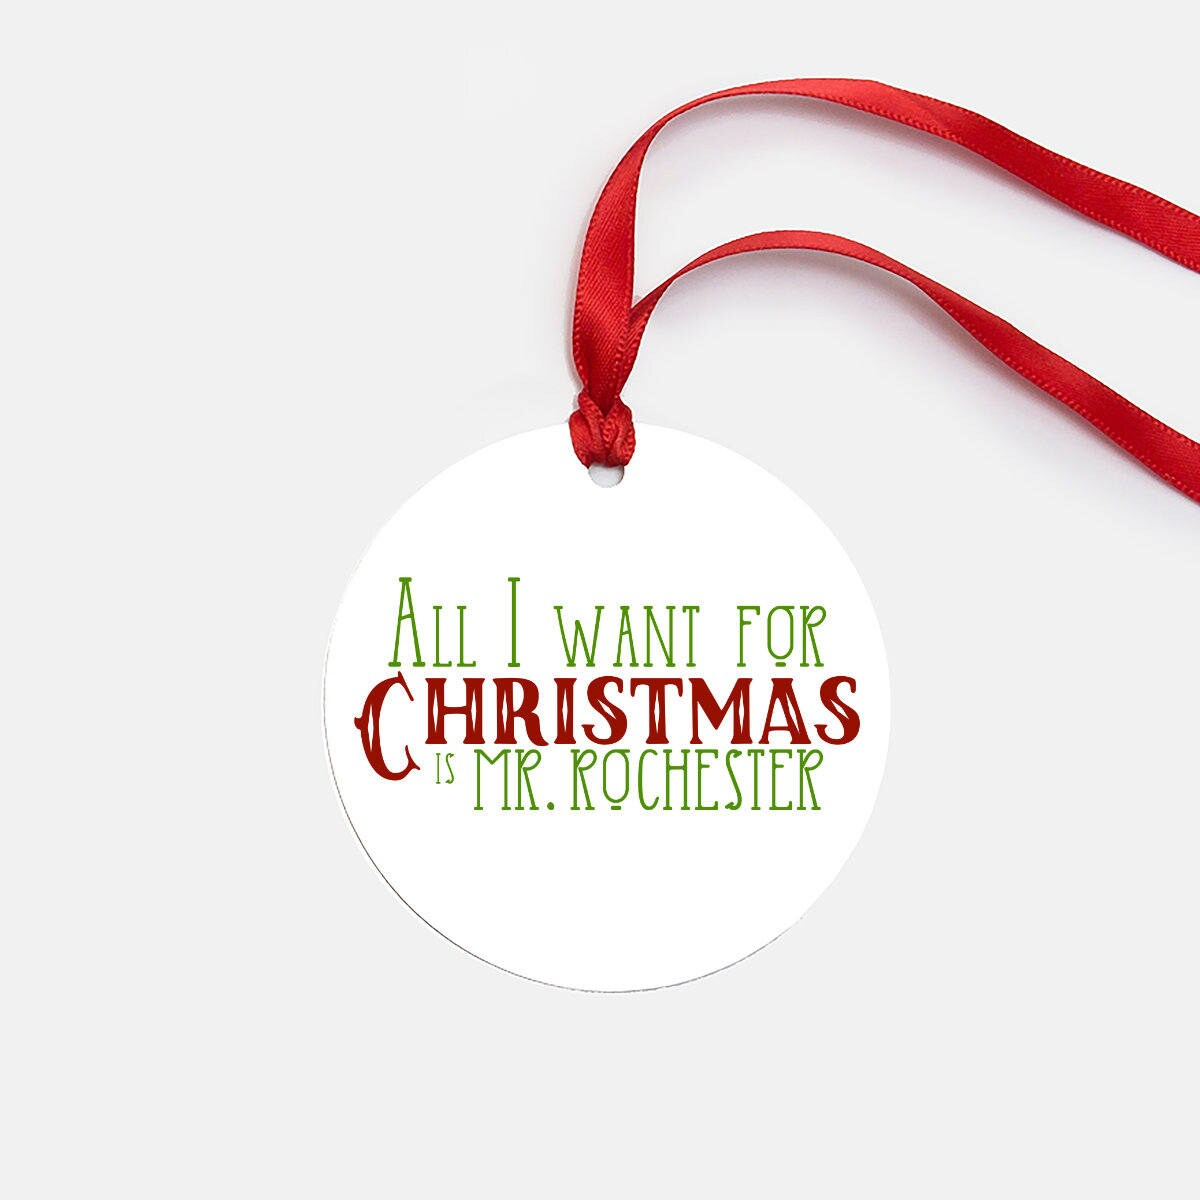 Jane Eyre Bookish Christmas Ornament White Elephant Gifts | Etsy